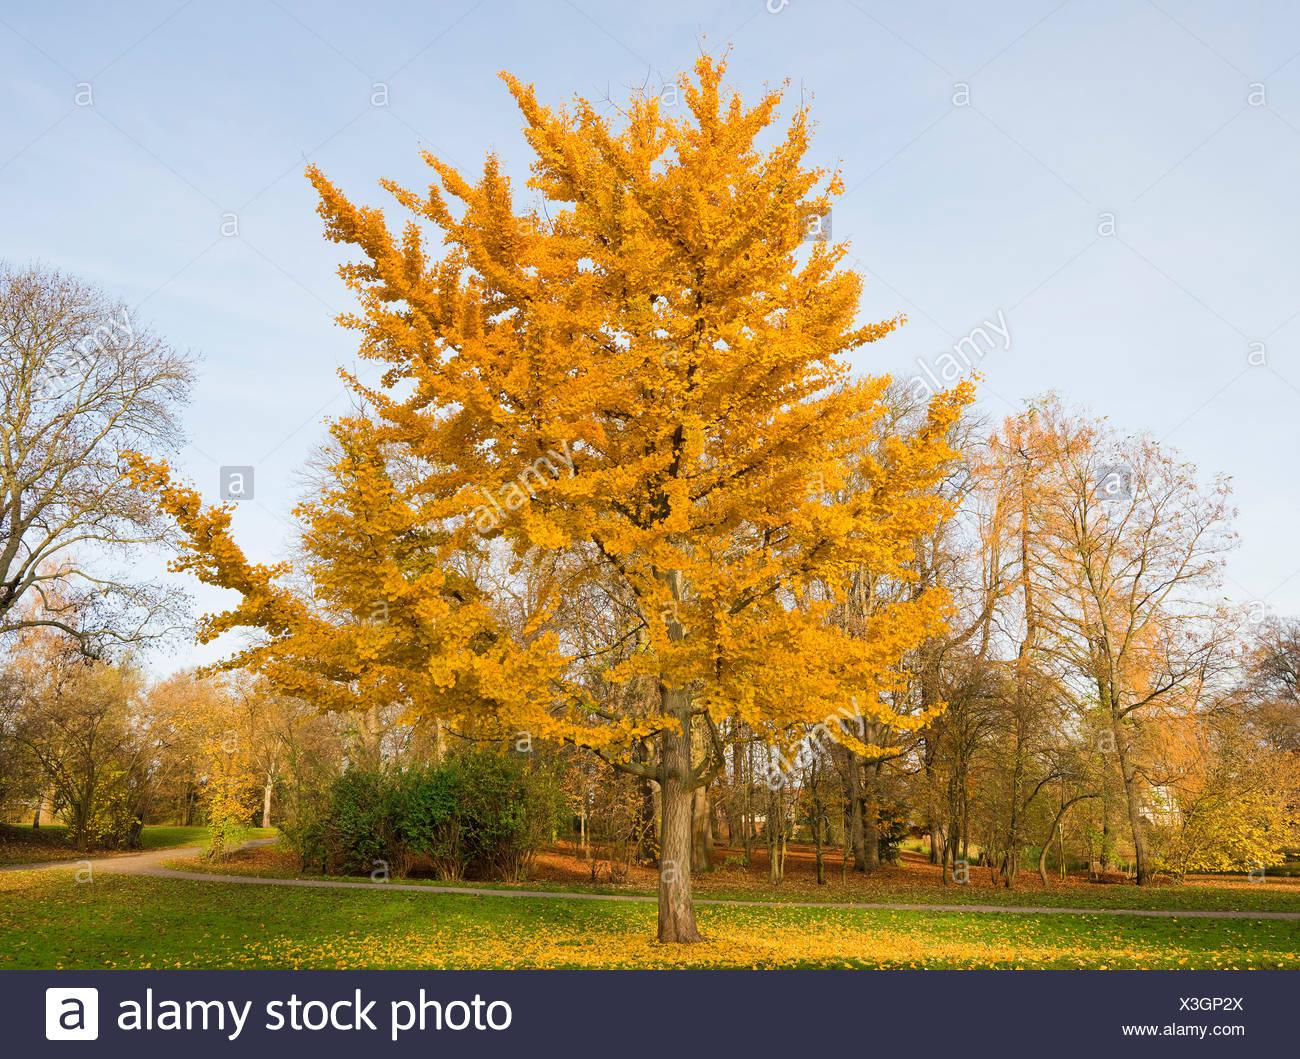 Ginkgo Tree Ginkgo Biloba With Colourful Autumnal Foliage Park